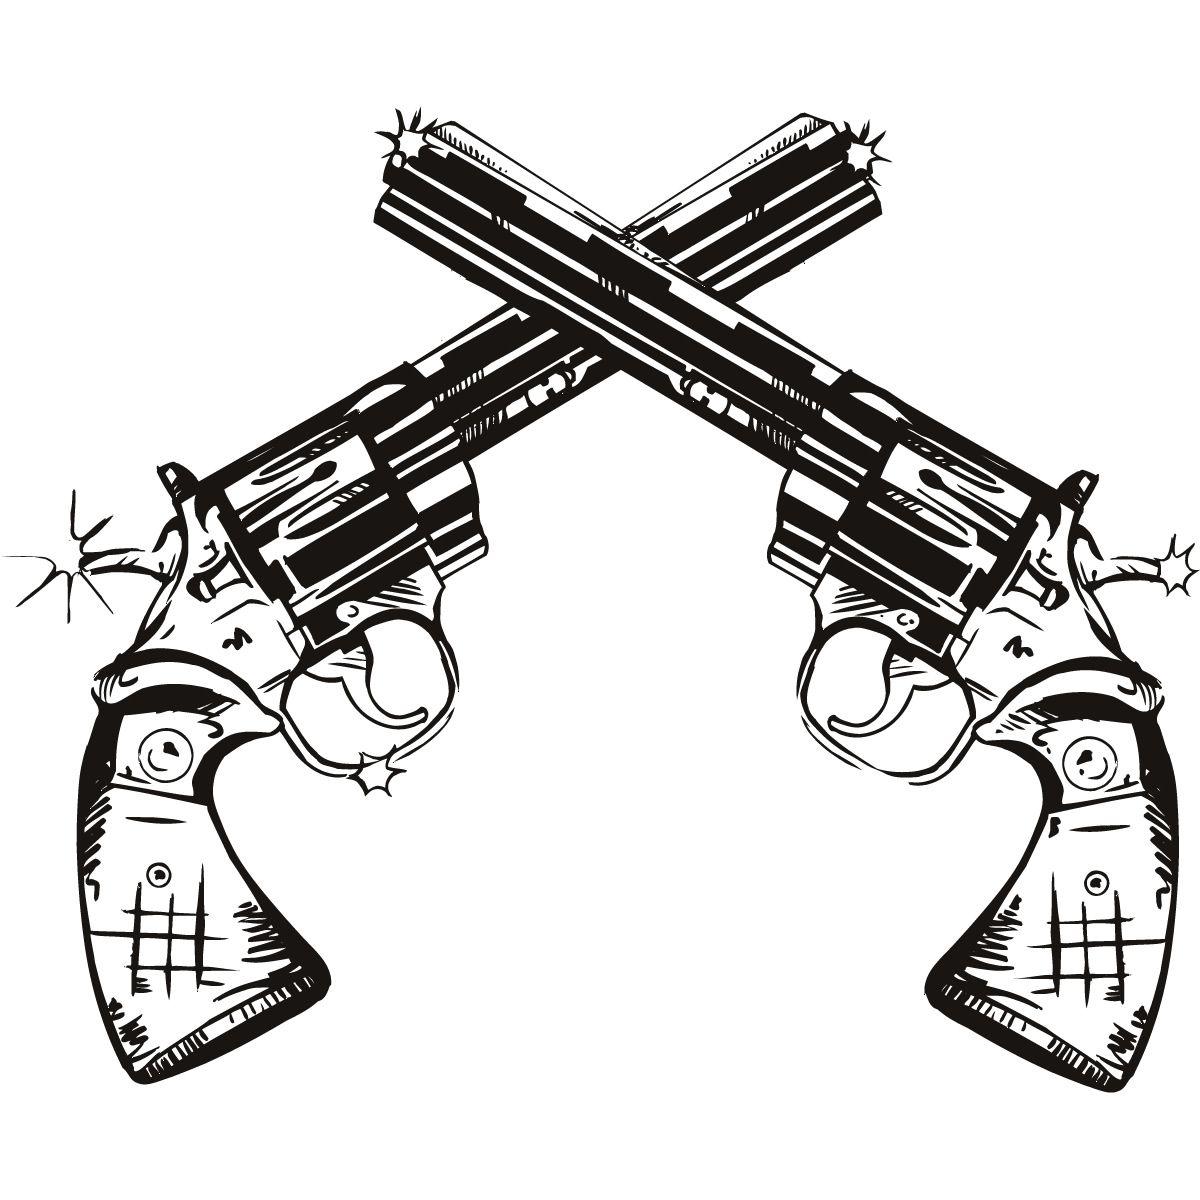 gun drawings | Gun Twin Pistols Wall Art Stickers Wall ...